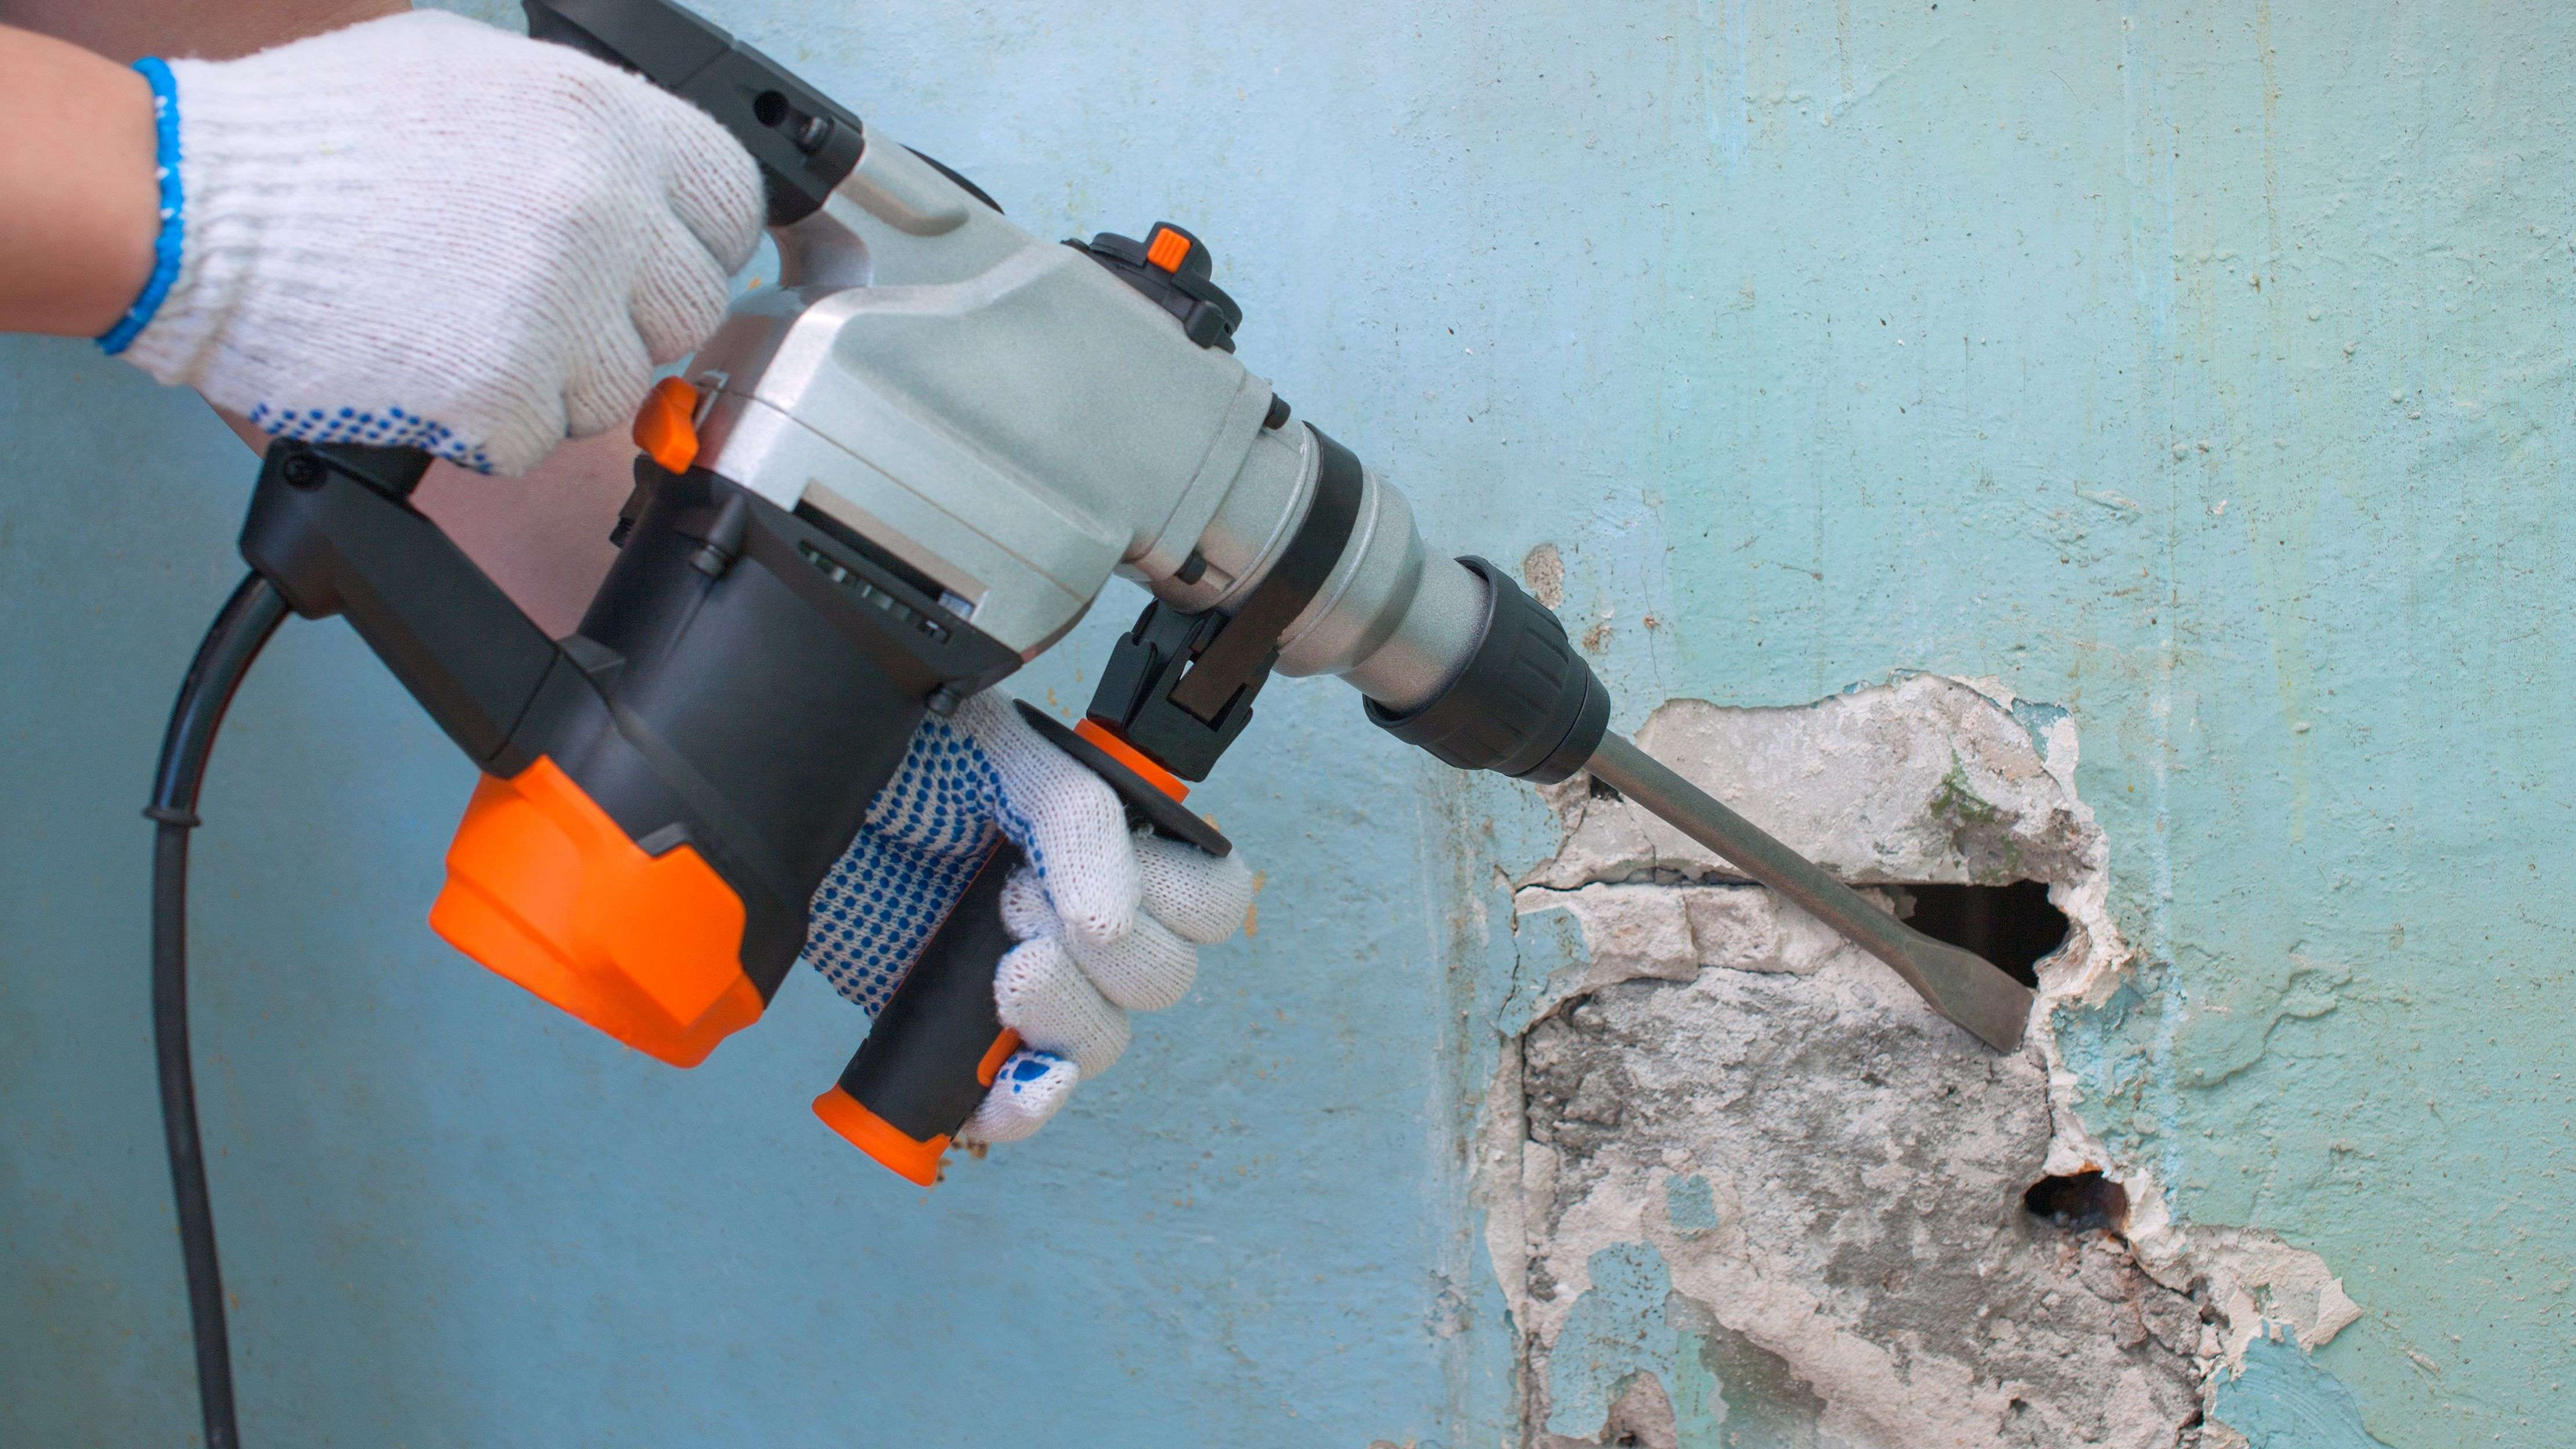 ¿Cómo elegir un martillo perforador?